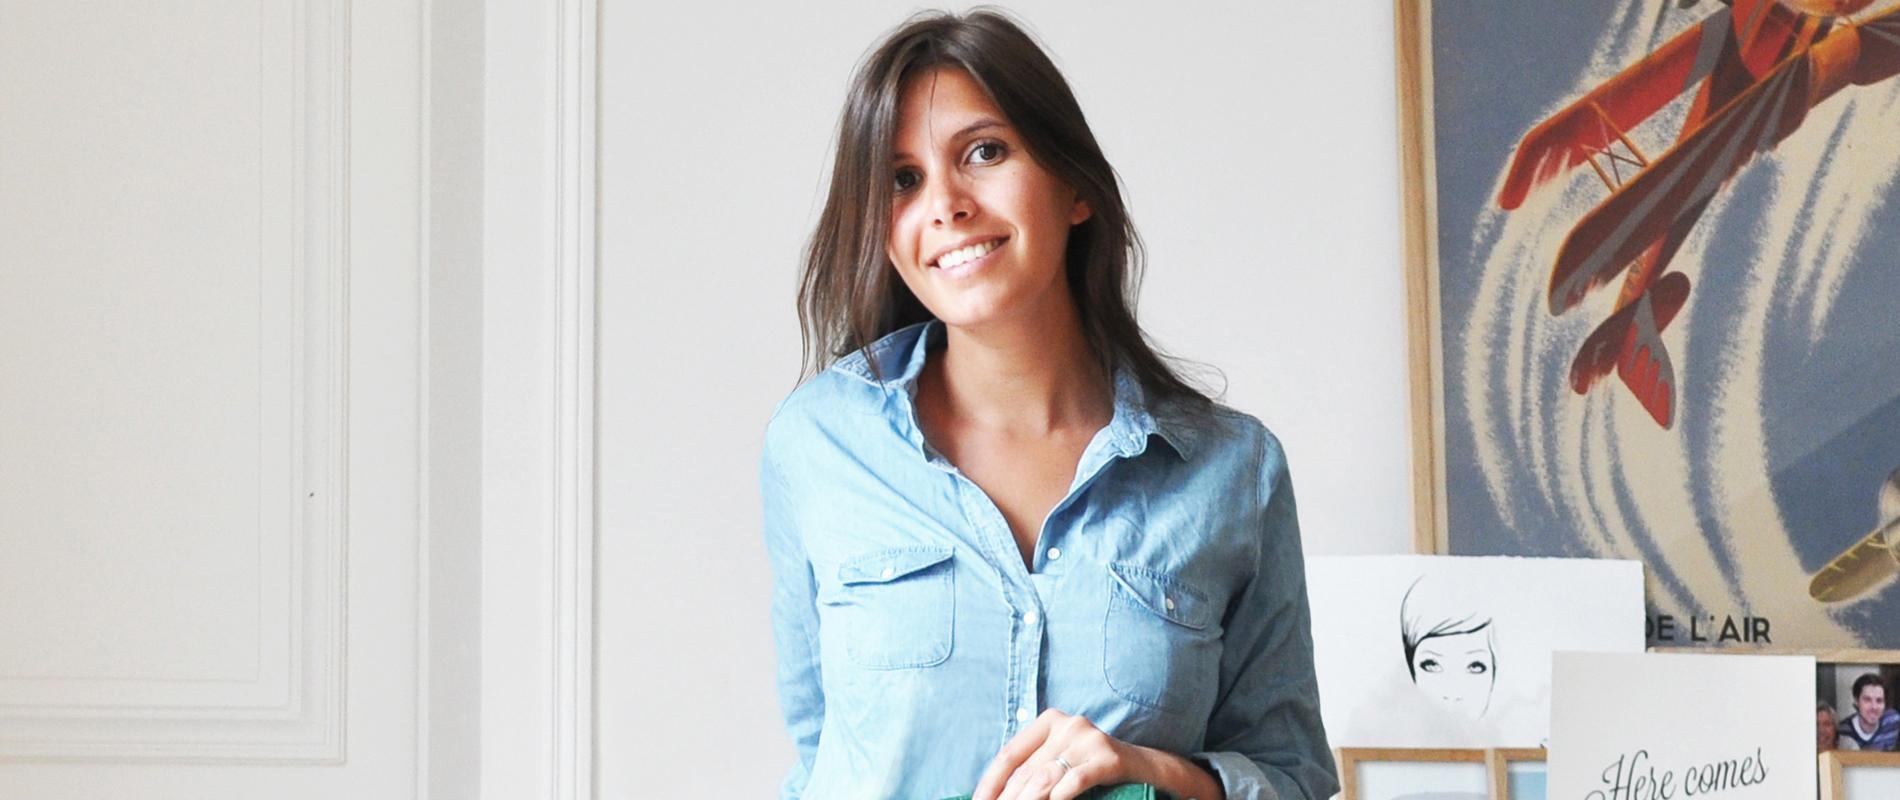 La Le Madame Qui Petite Sézane Web Griffe Affole Figaro dqvyX4